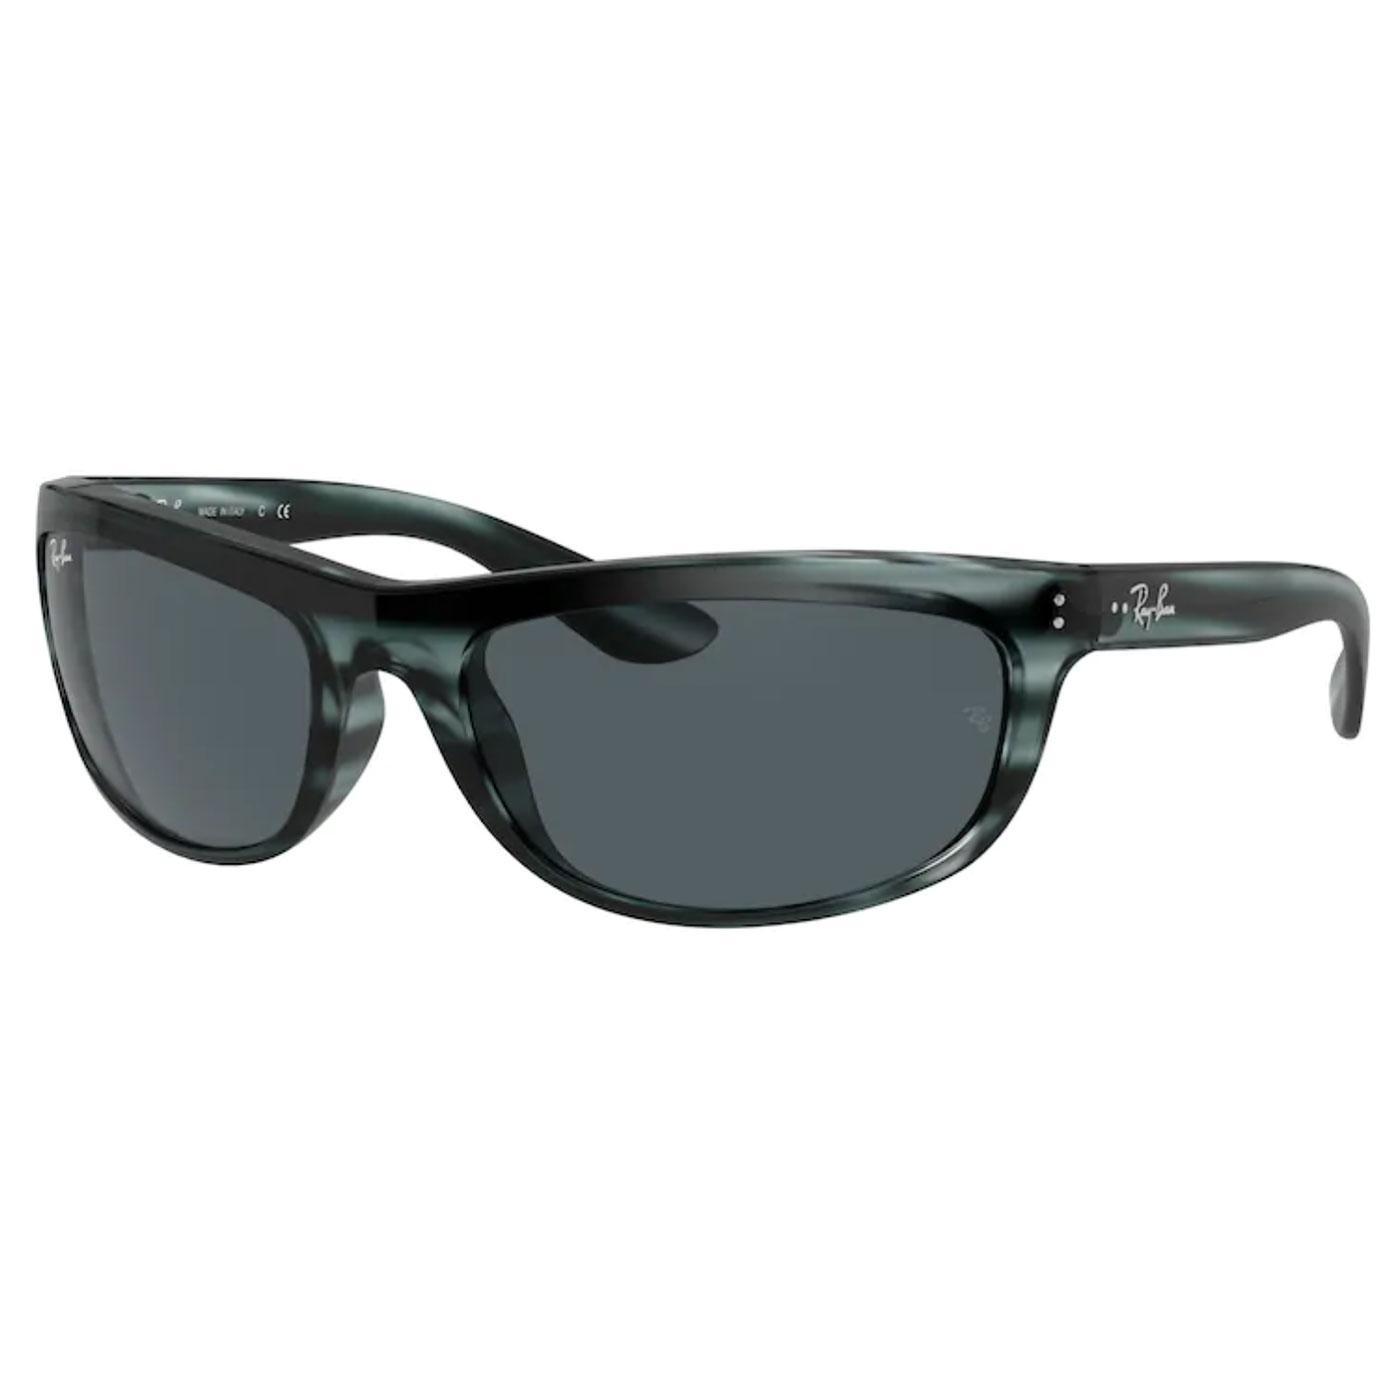 Balorama RAY-BAN Wrap Round Sunglasses - Blue/Grey